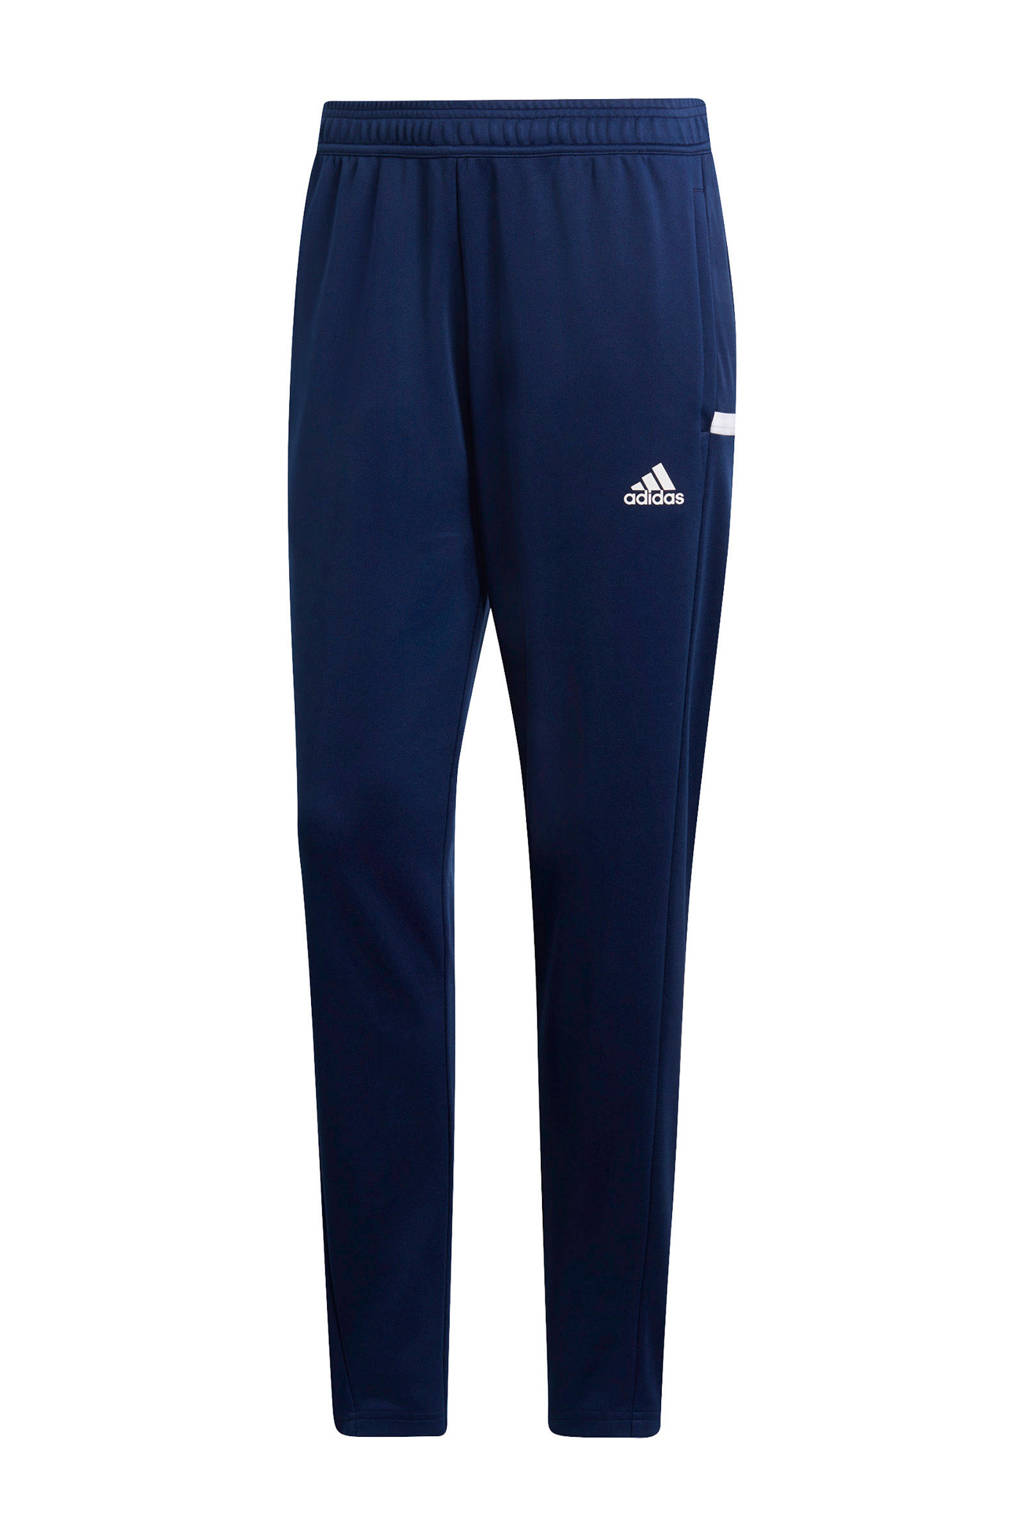 adidas Performance trainingsbroek T19 donkerblauw, Donkerblauw/wit